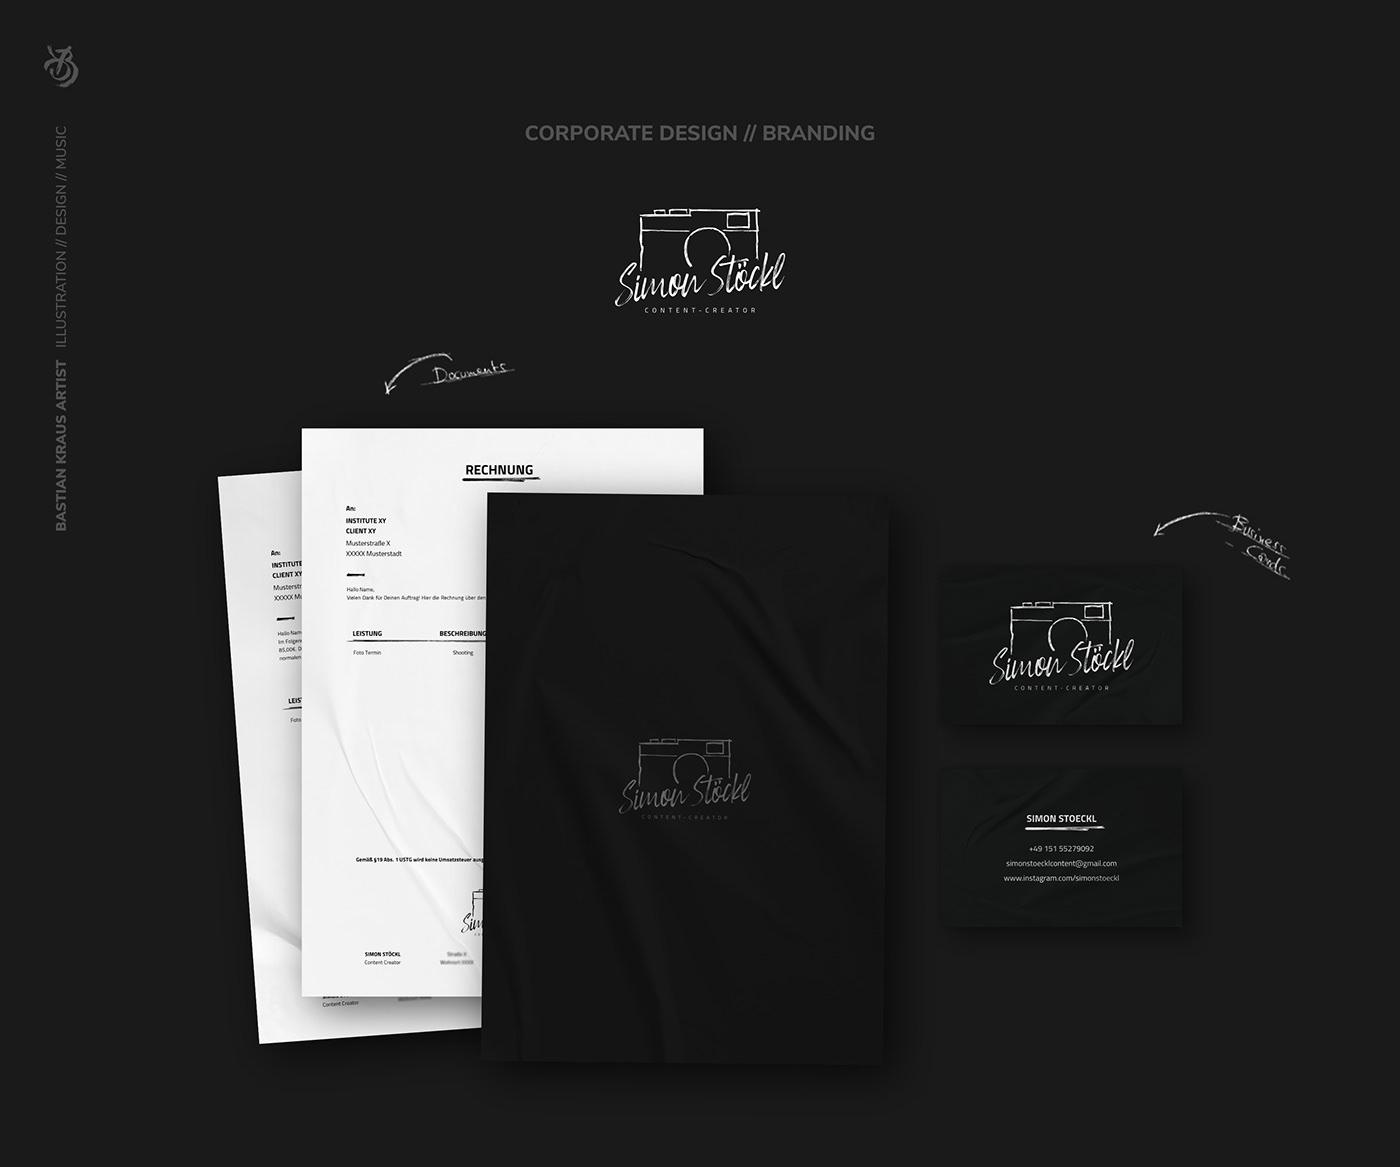 SIMON STÖCKL // Overview